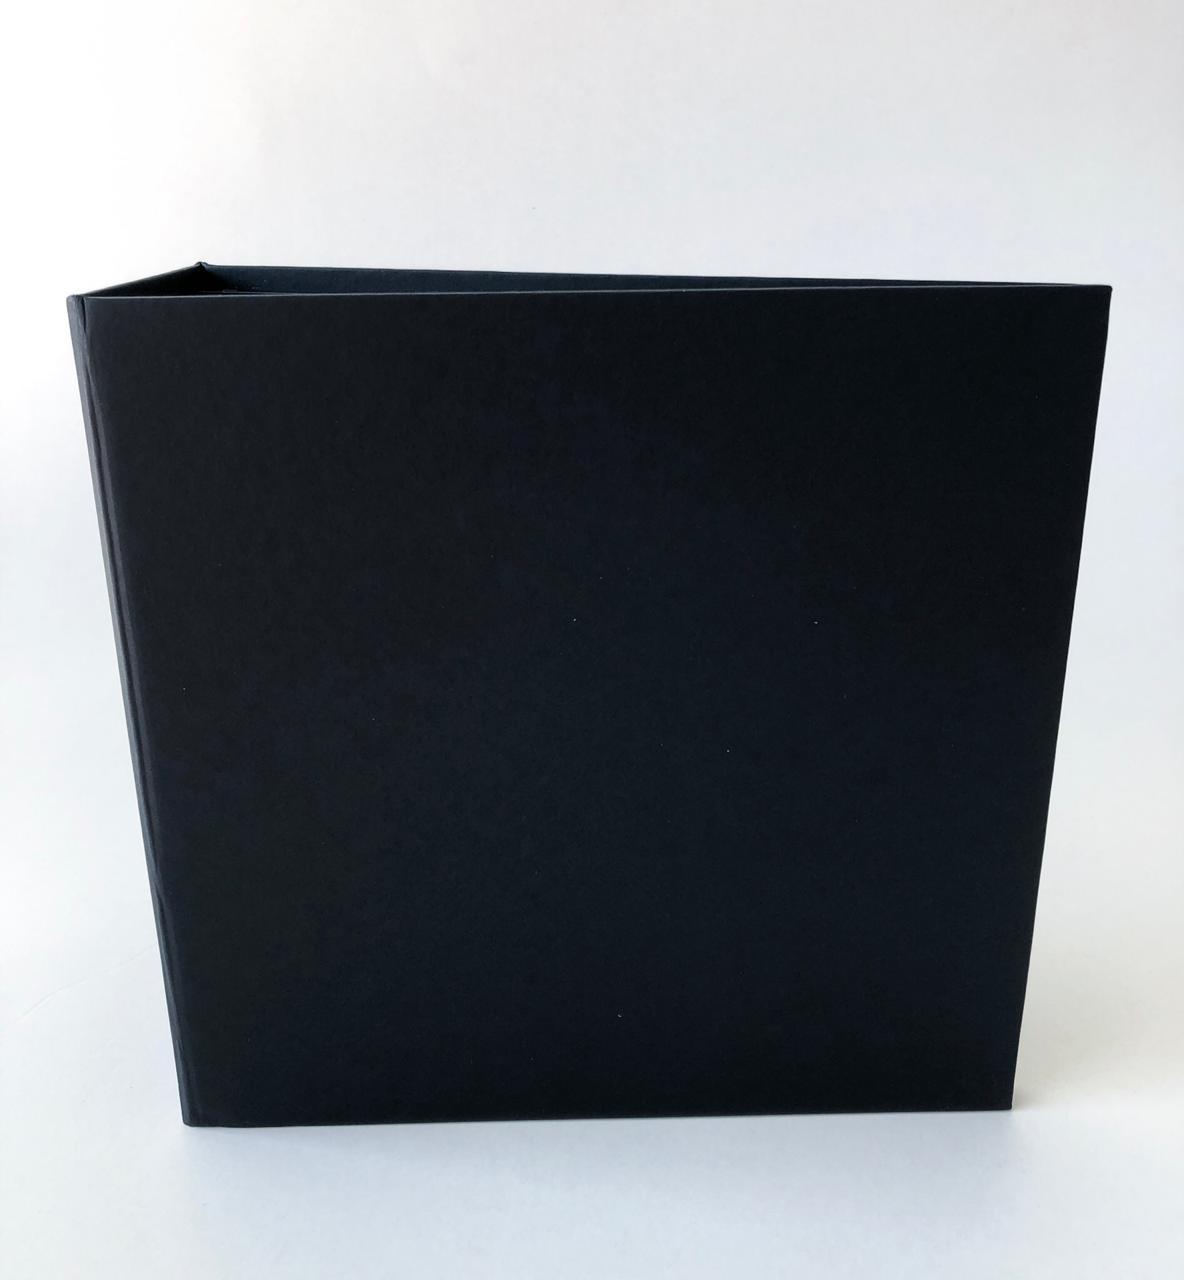 Álbum 20 x 20 com lombada Preto - JuJu Scrapbook  - JuJu Scrapbook